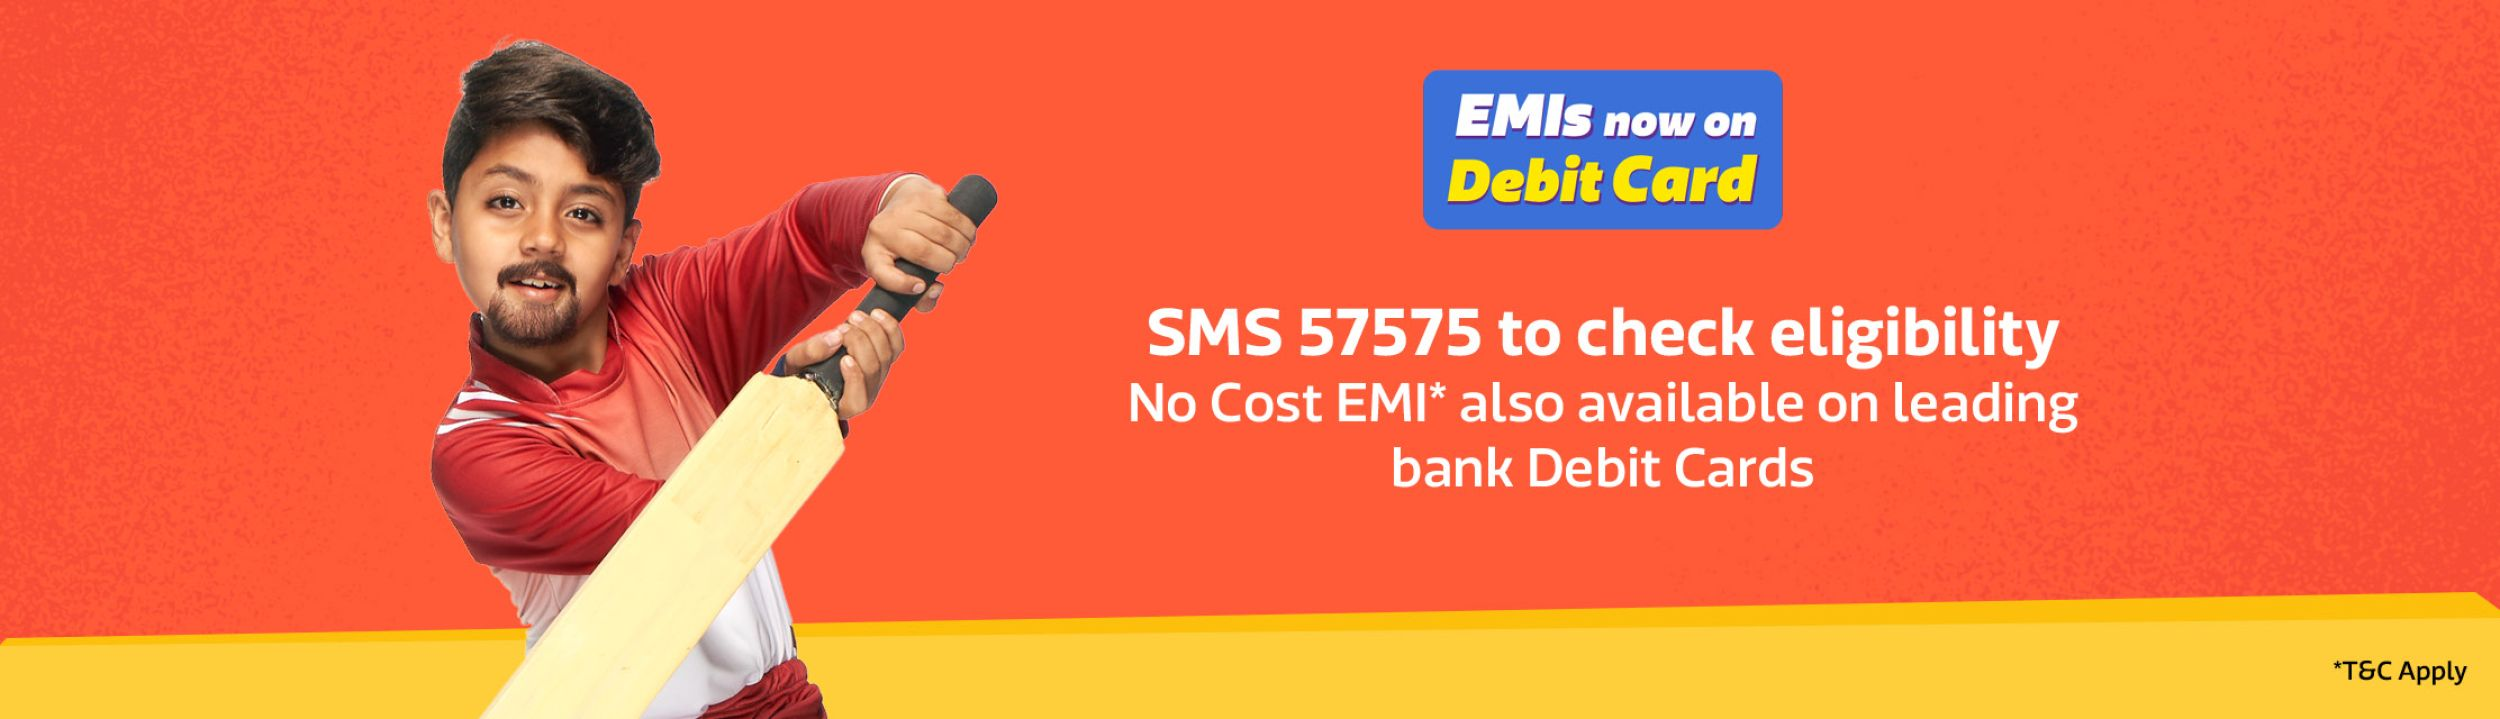 75cac8f37 ... EMI on debit card option. sada sada